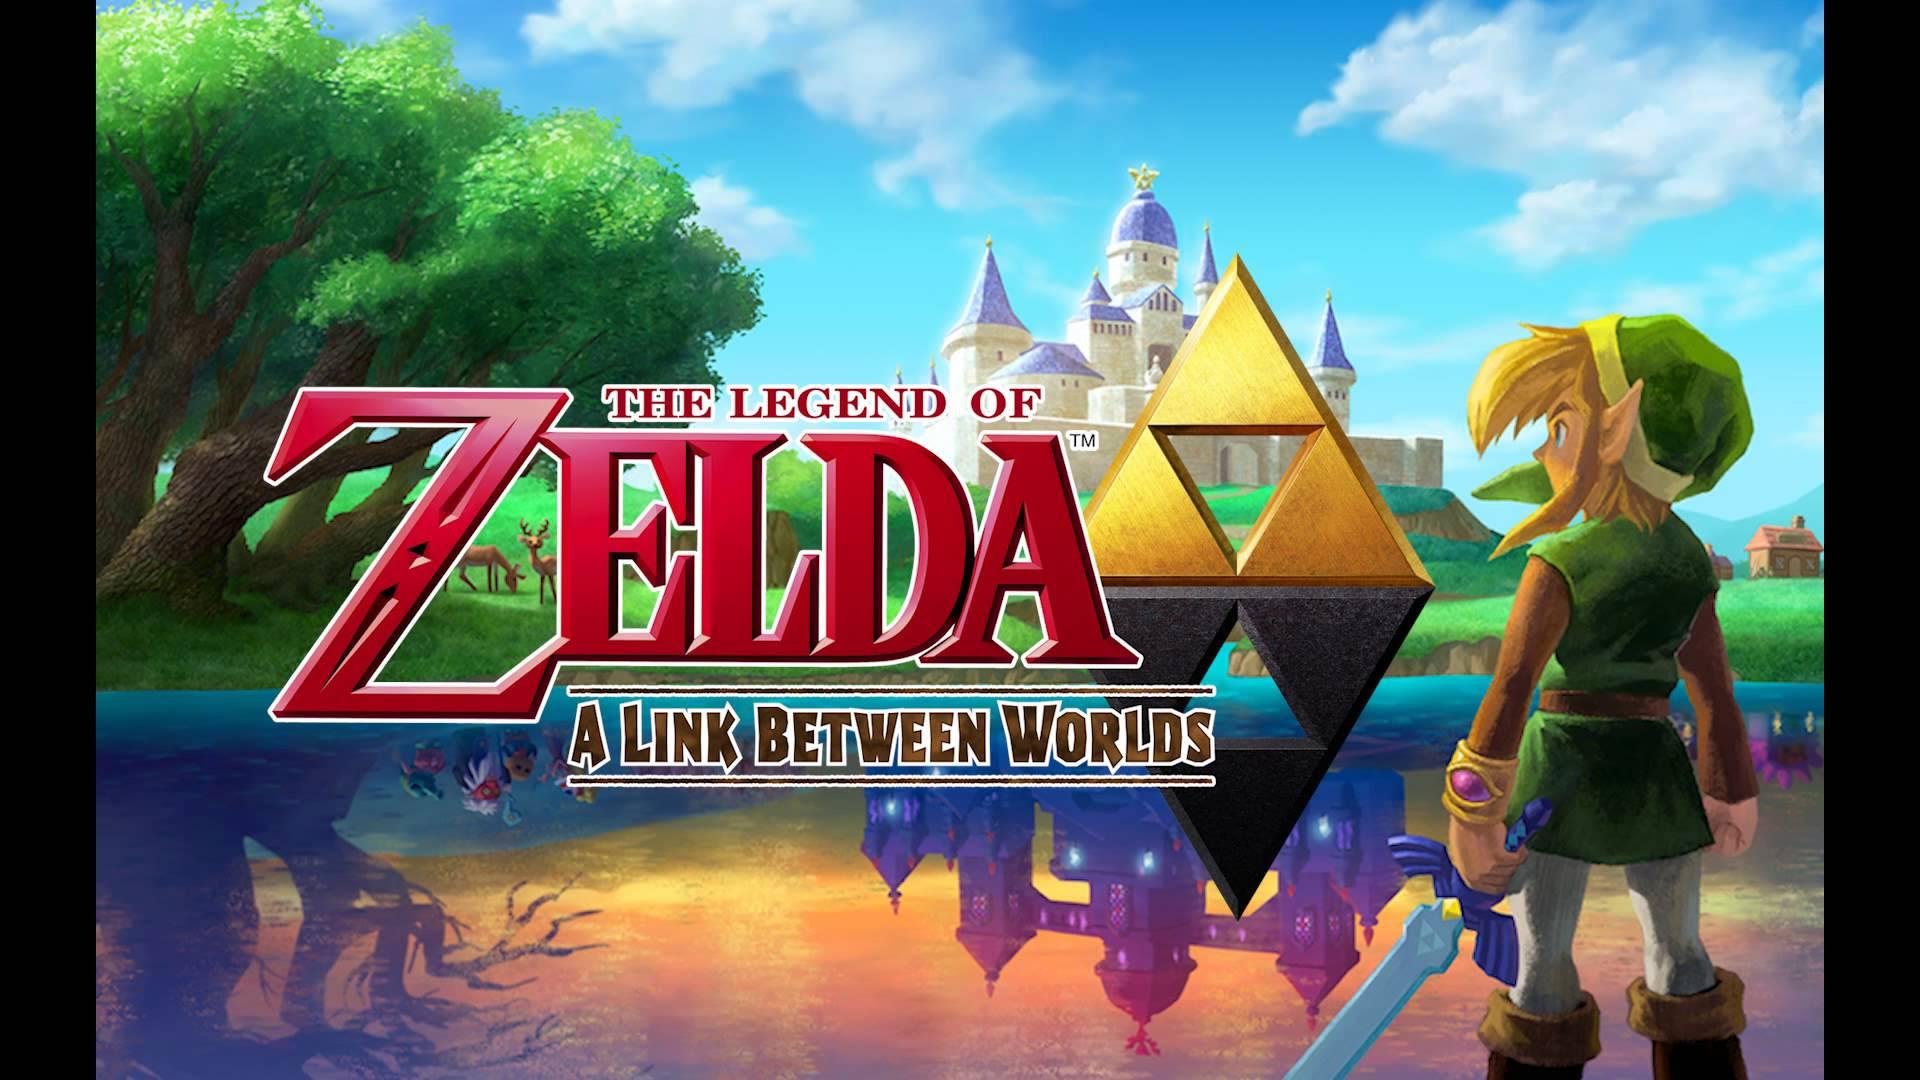 The Legend Of Zelda Ocarina Of Time D Hd Desktop Wallpaper 1920x1080